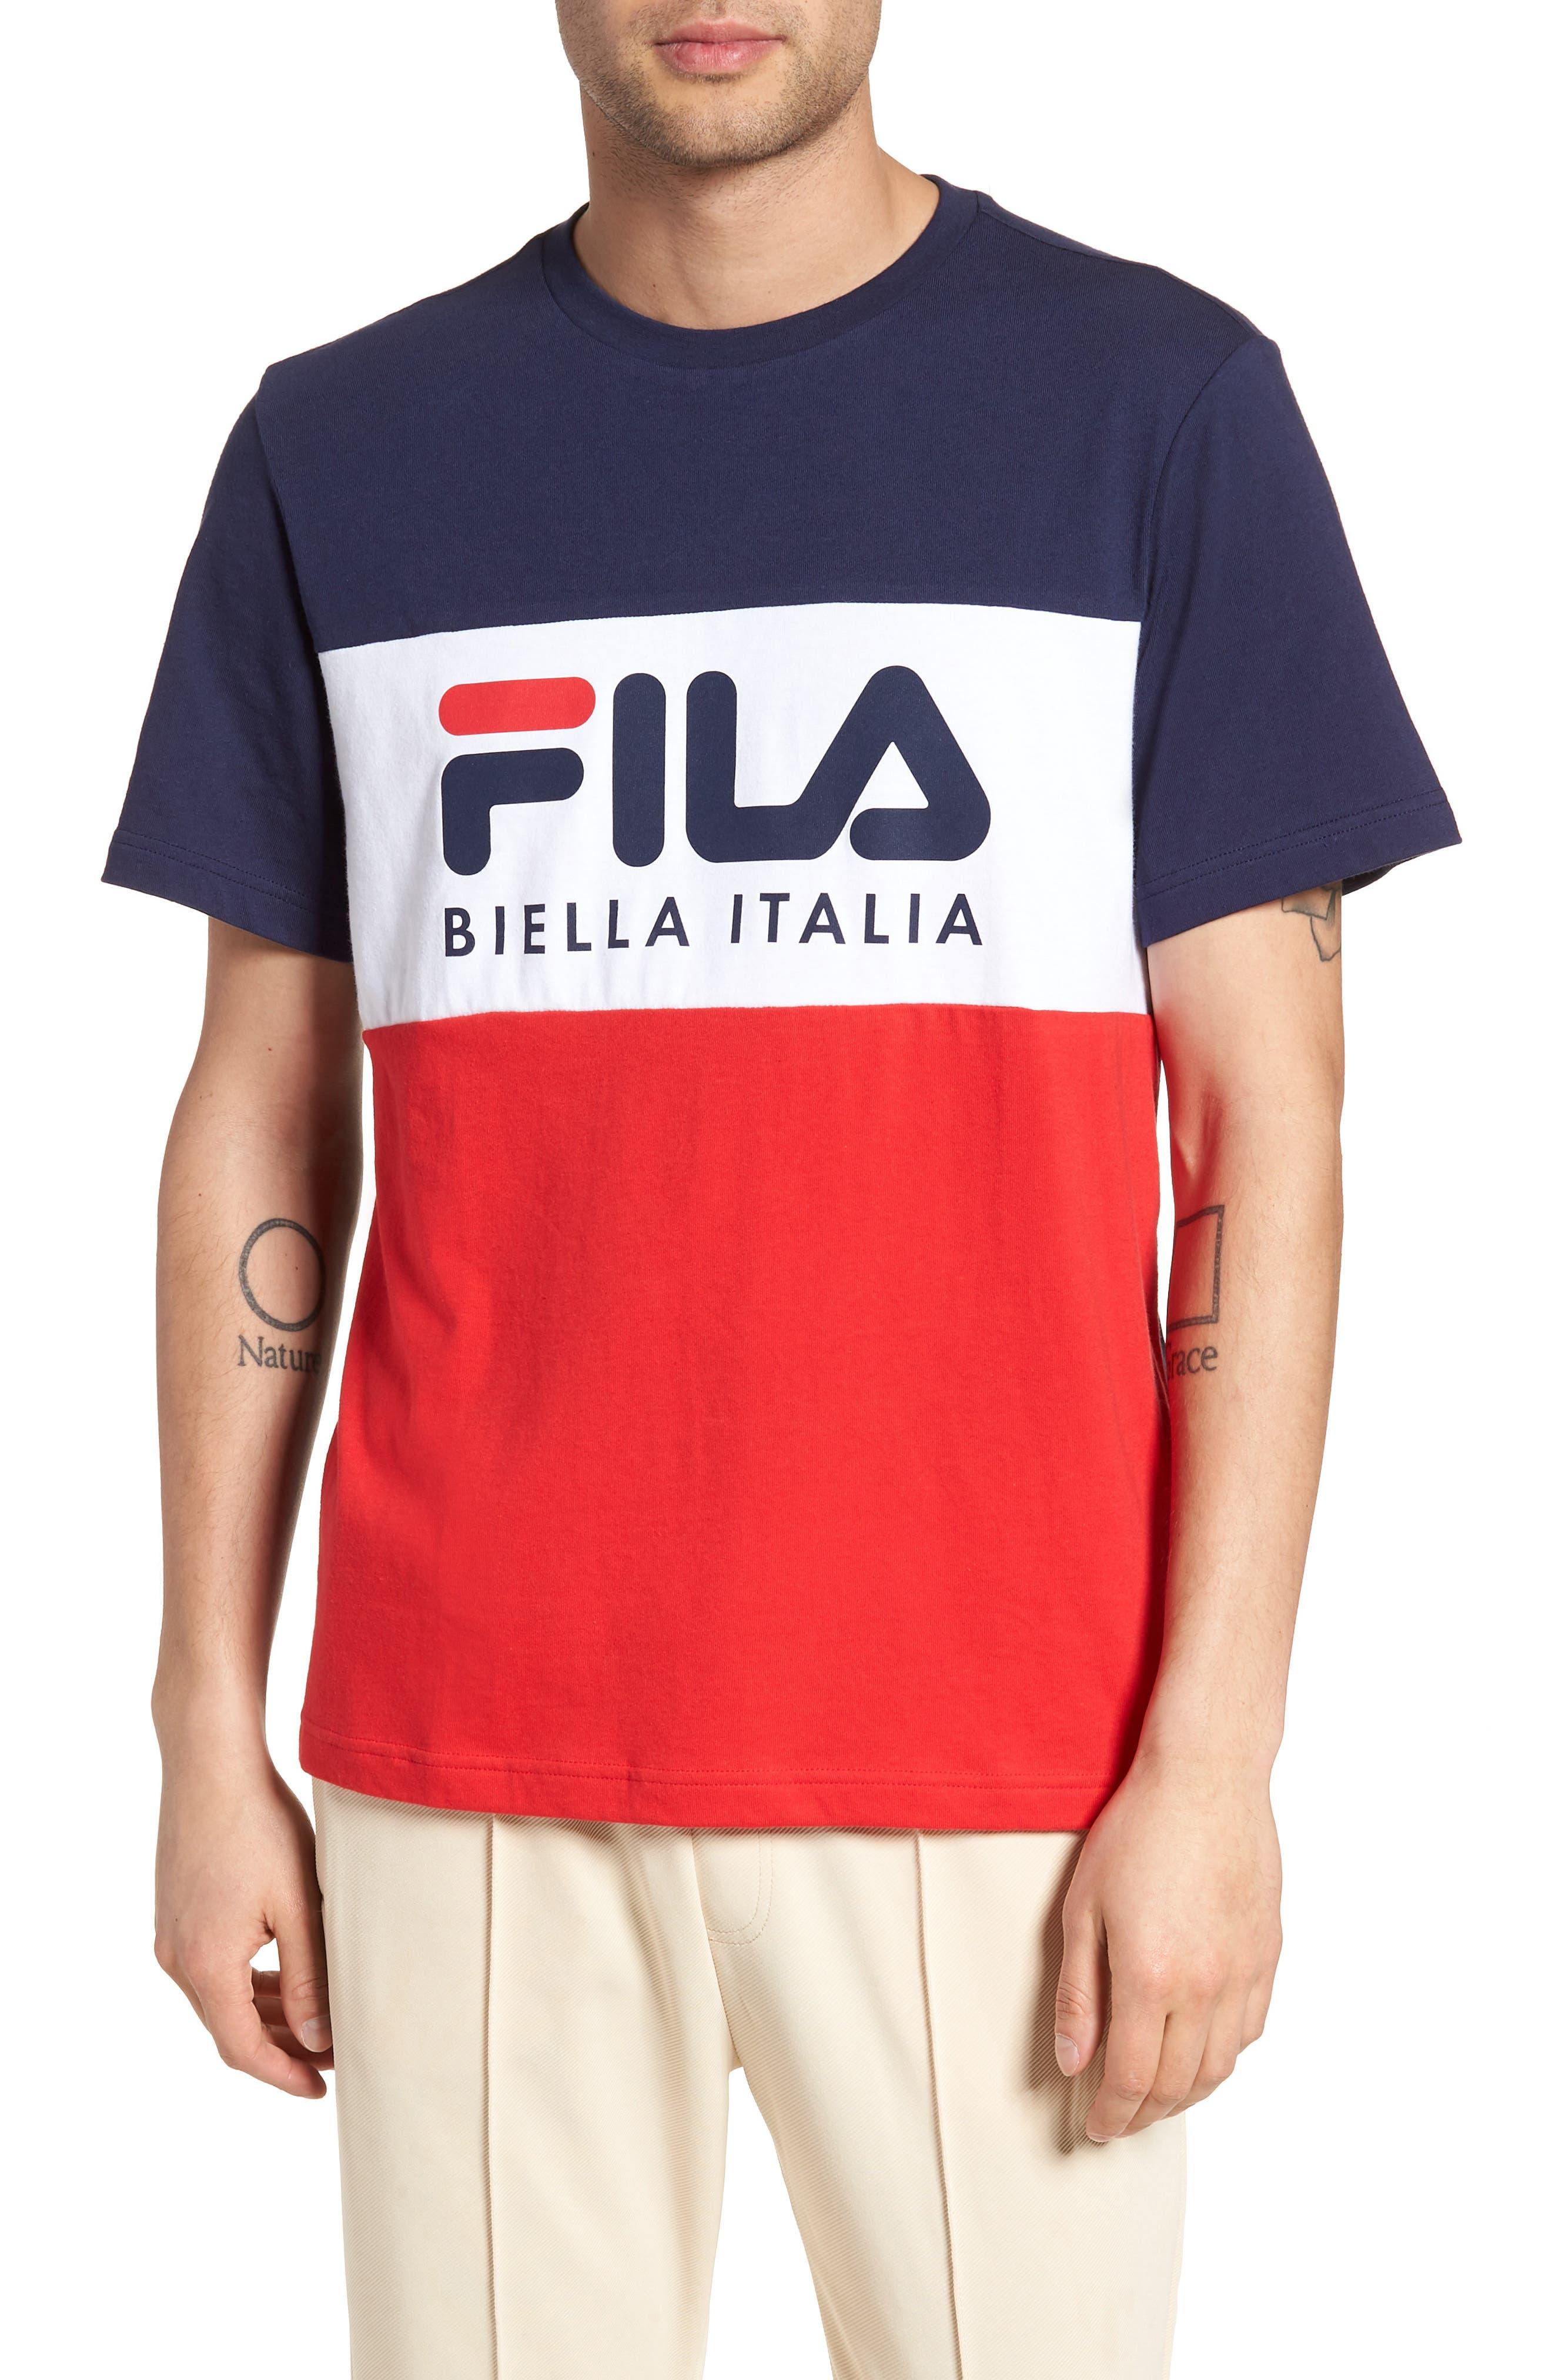 Biella Italia T-Shirt,                             Main thumbnail 1, color,                             Navy/ White/ Red